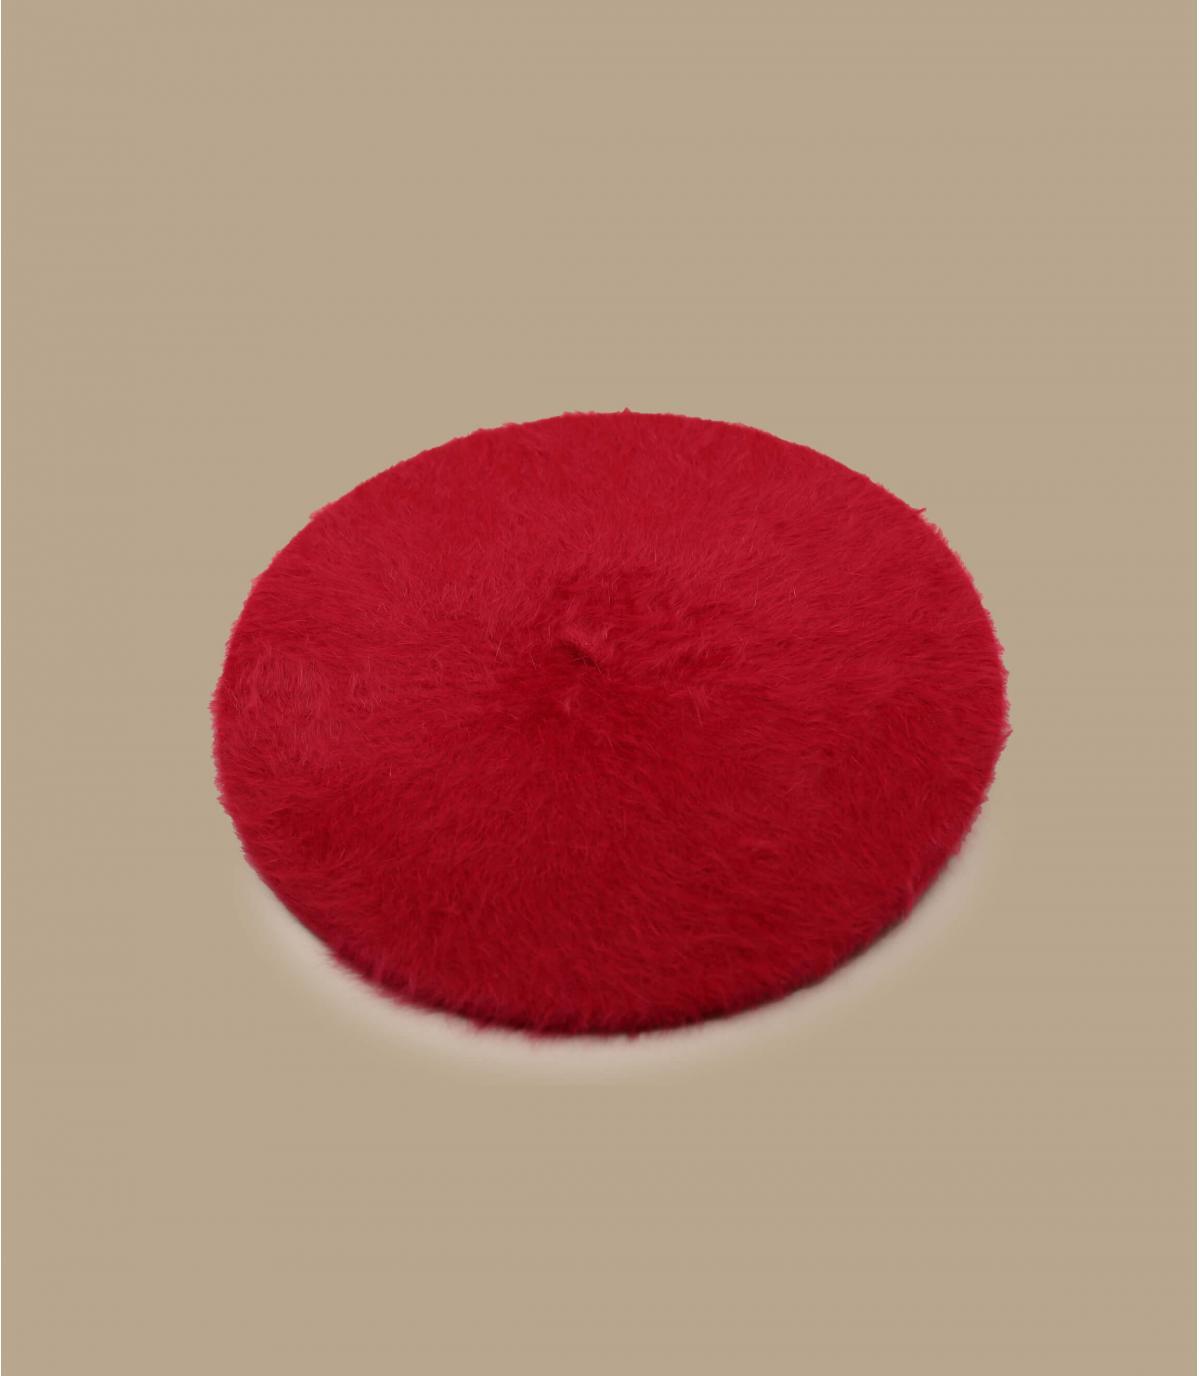 Dettagli Berretto angora hermes - image 2